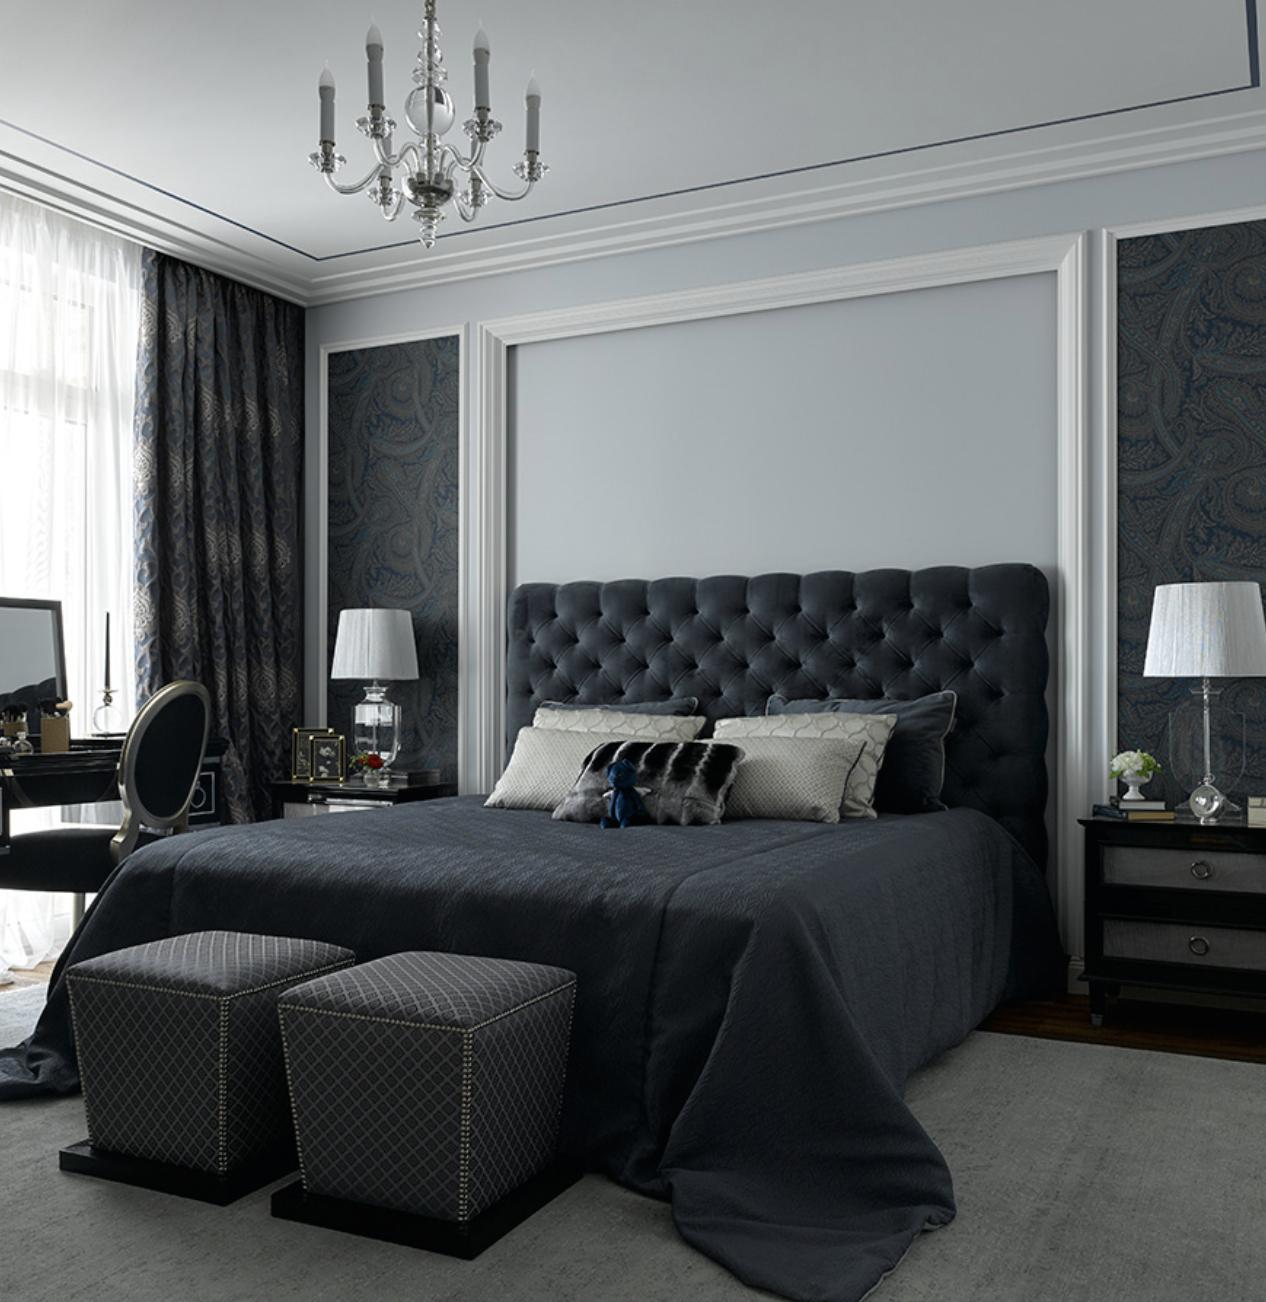 Popova Design Luxury, elegant and beautiful bark bedroom